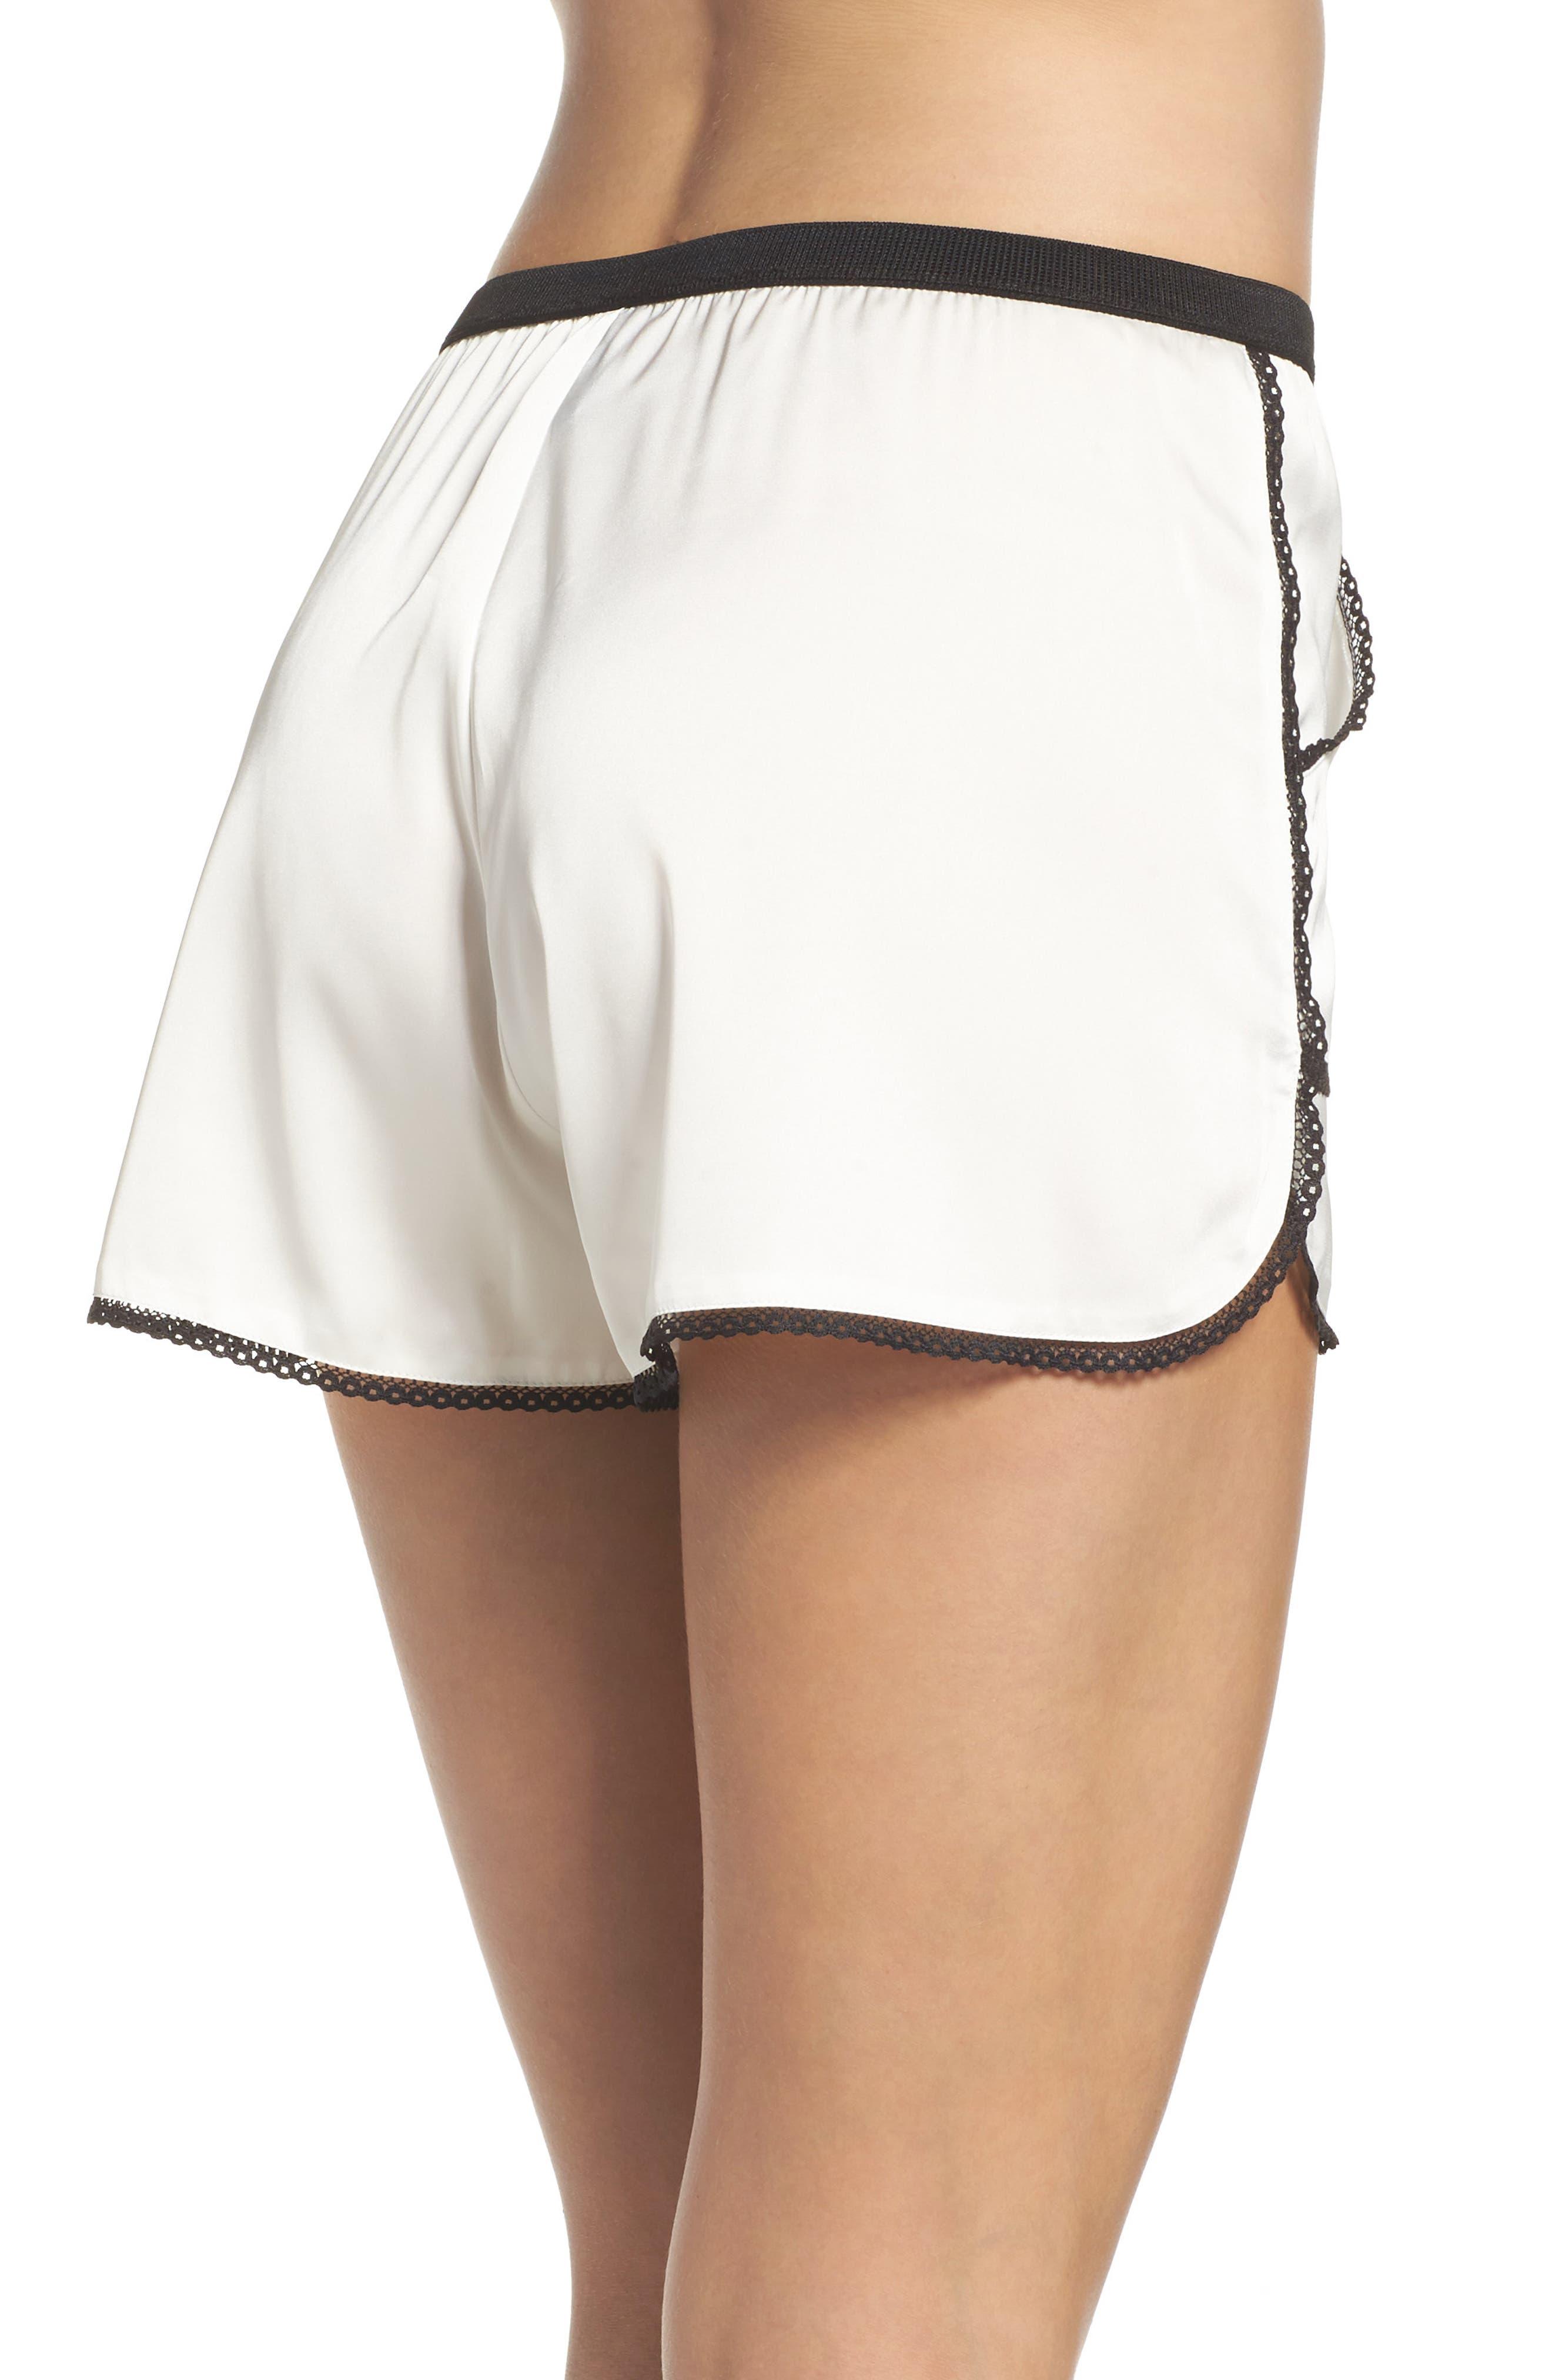 Thistle & Spire Devoe Satin Pajama Shorts,                             Alternate thumbnail 2, color,                             900